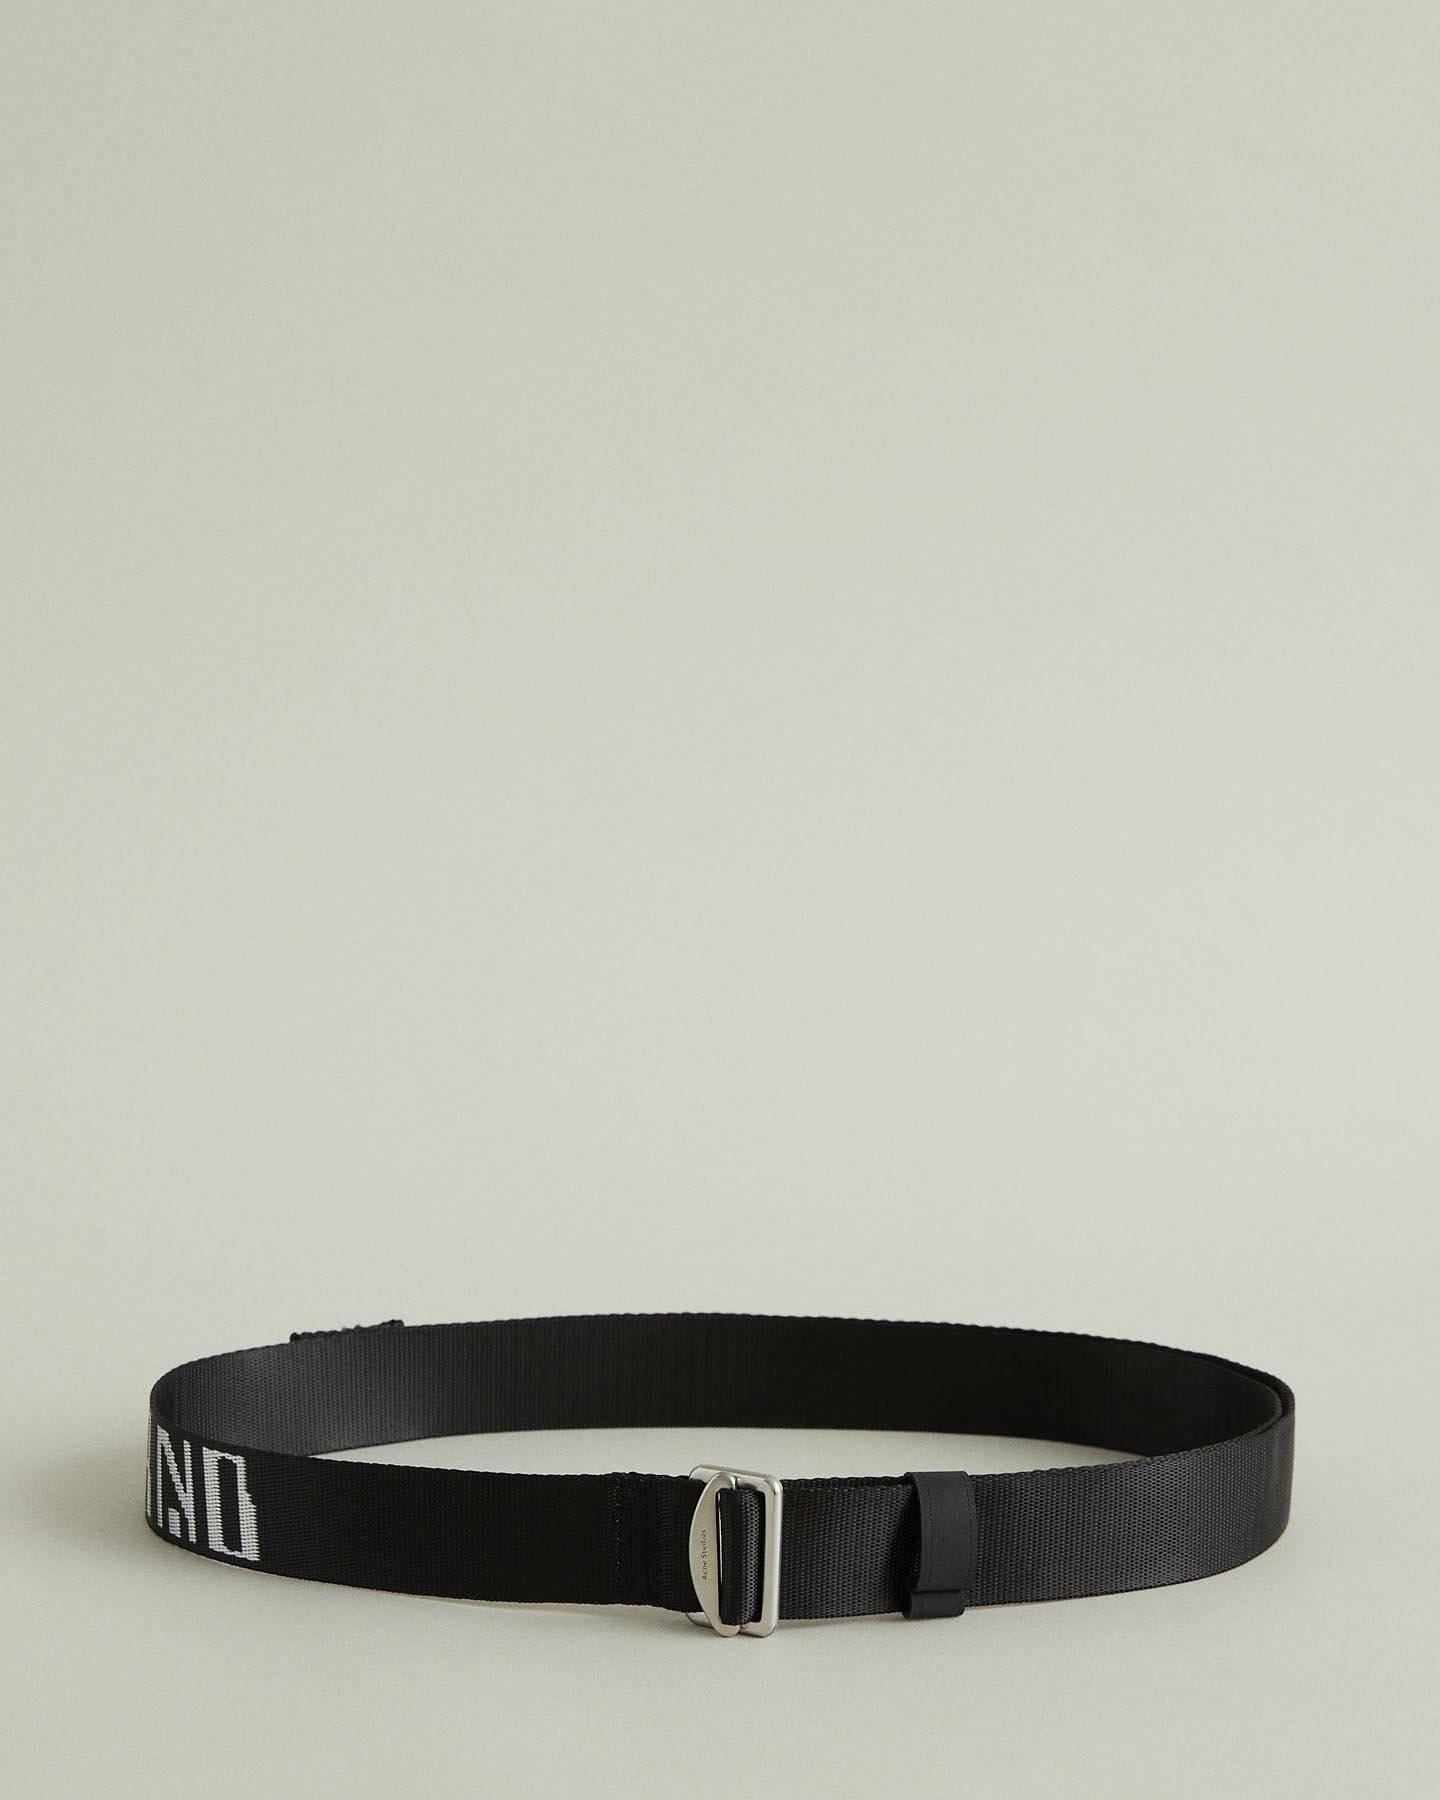 /products/welte-brand-nylon-webbing-belt